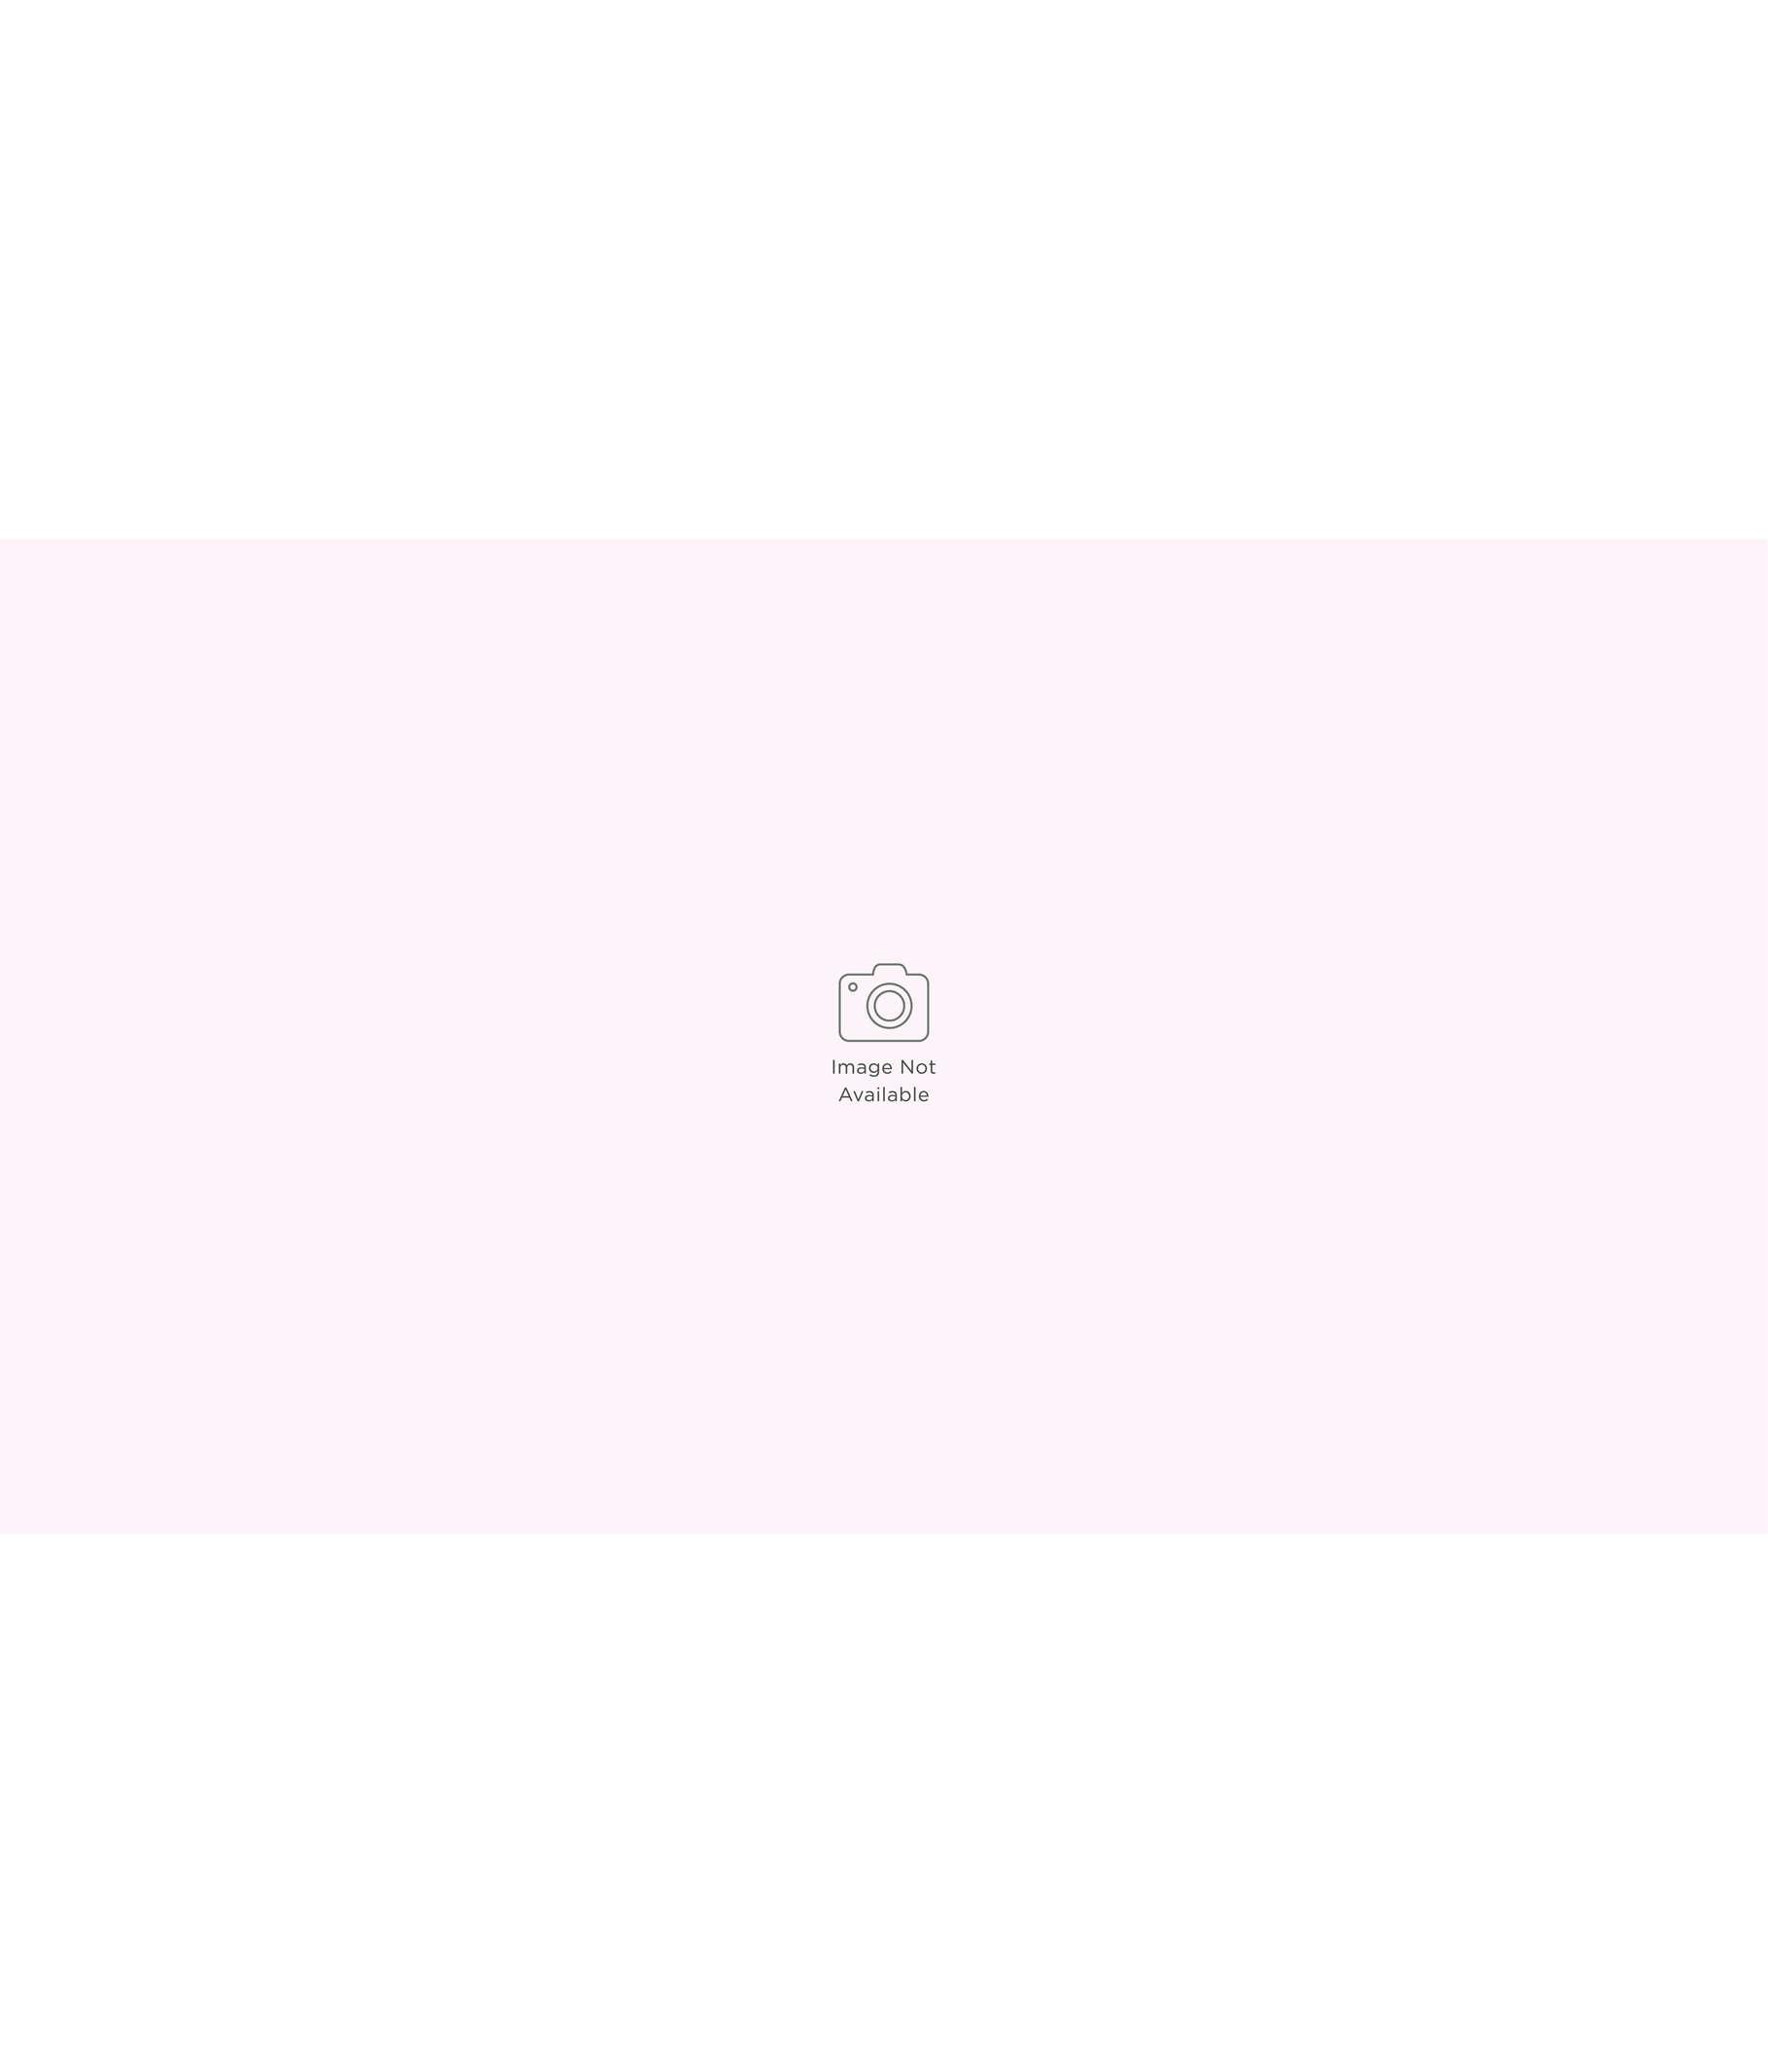 a79b7674100d0 Hanky Panky V-Kini, Hotty Pink Luscious, large ...